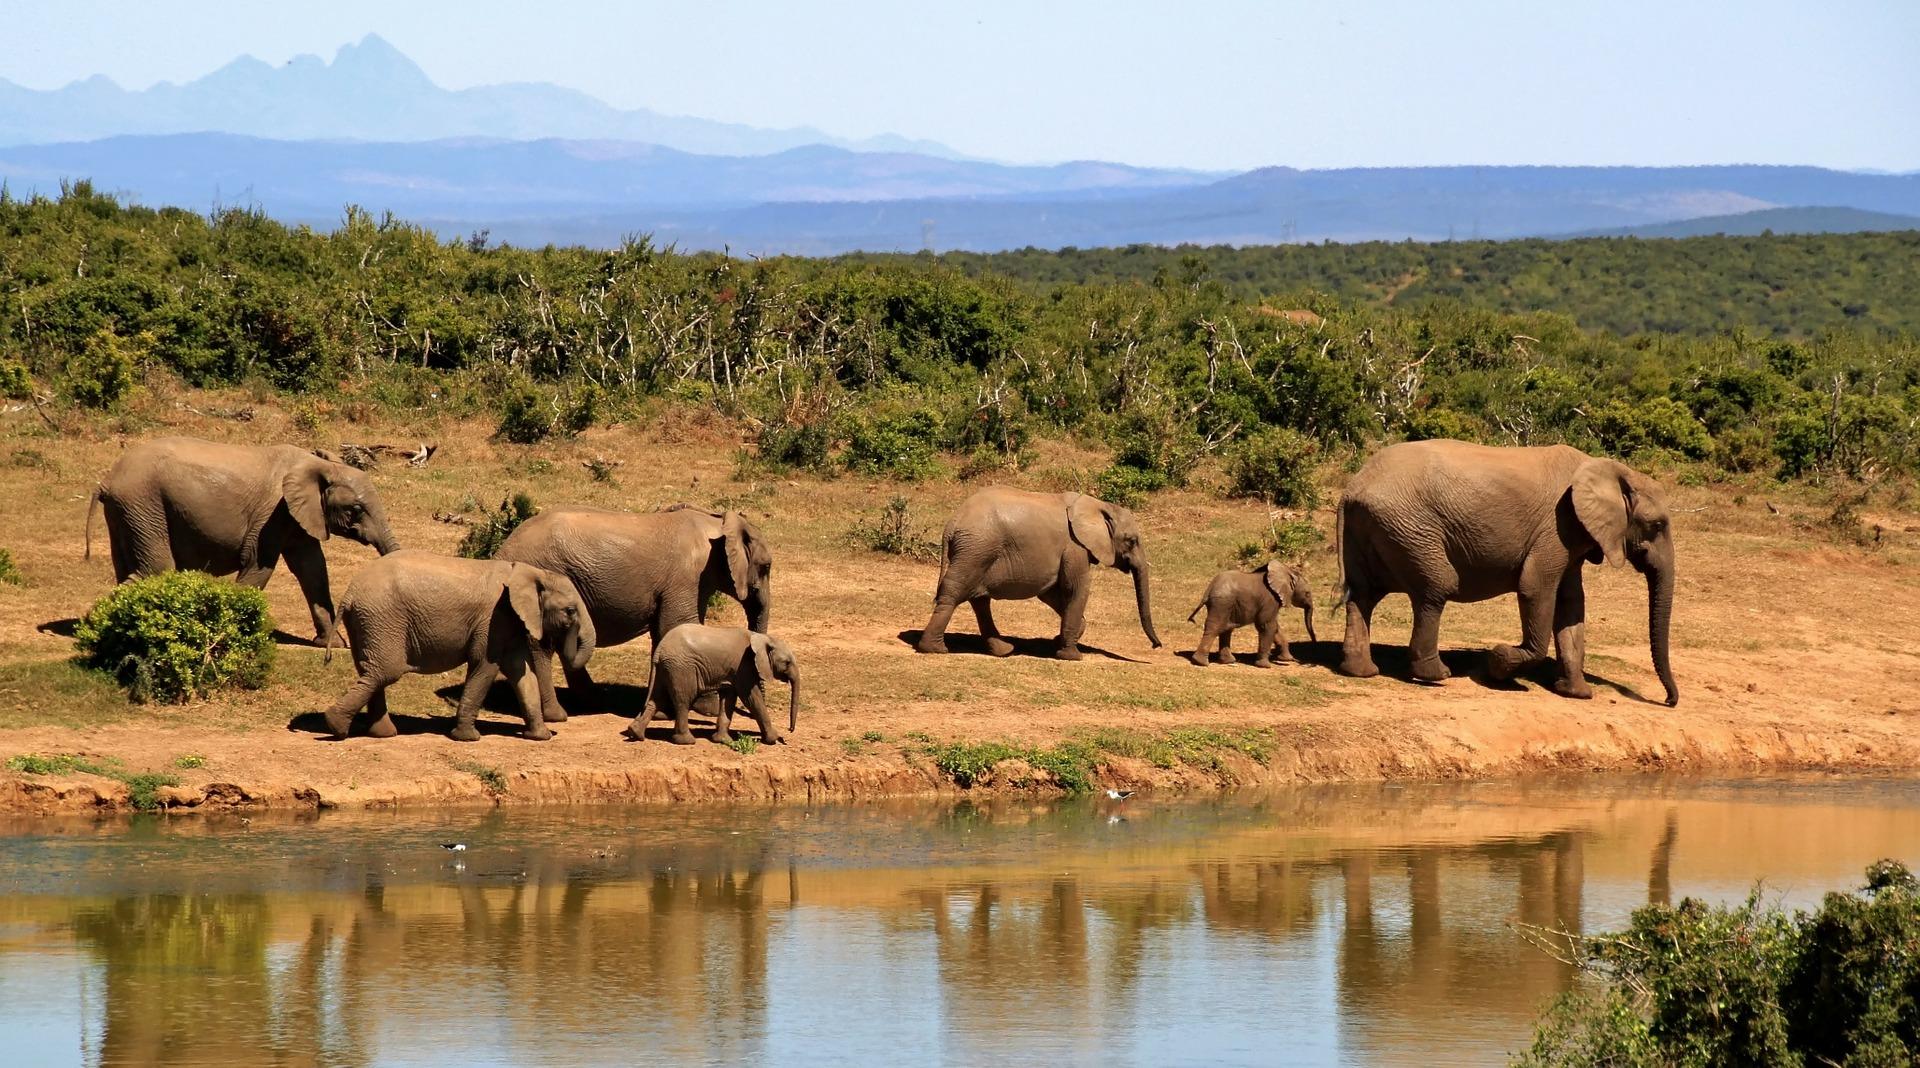 elephant-279505_1920 (1)